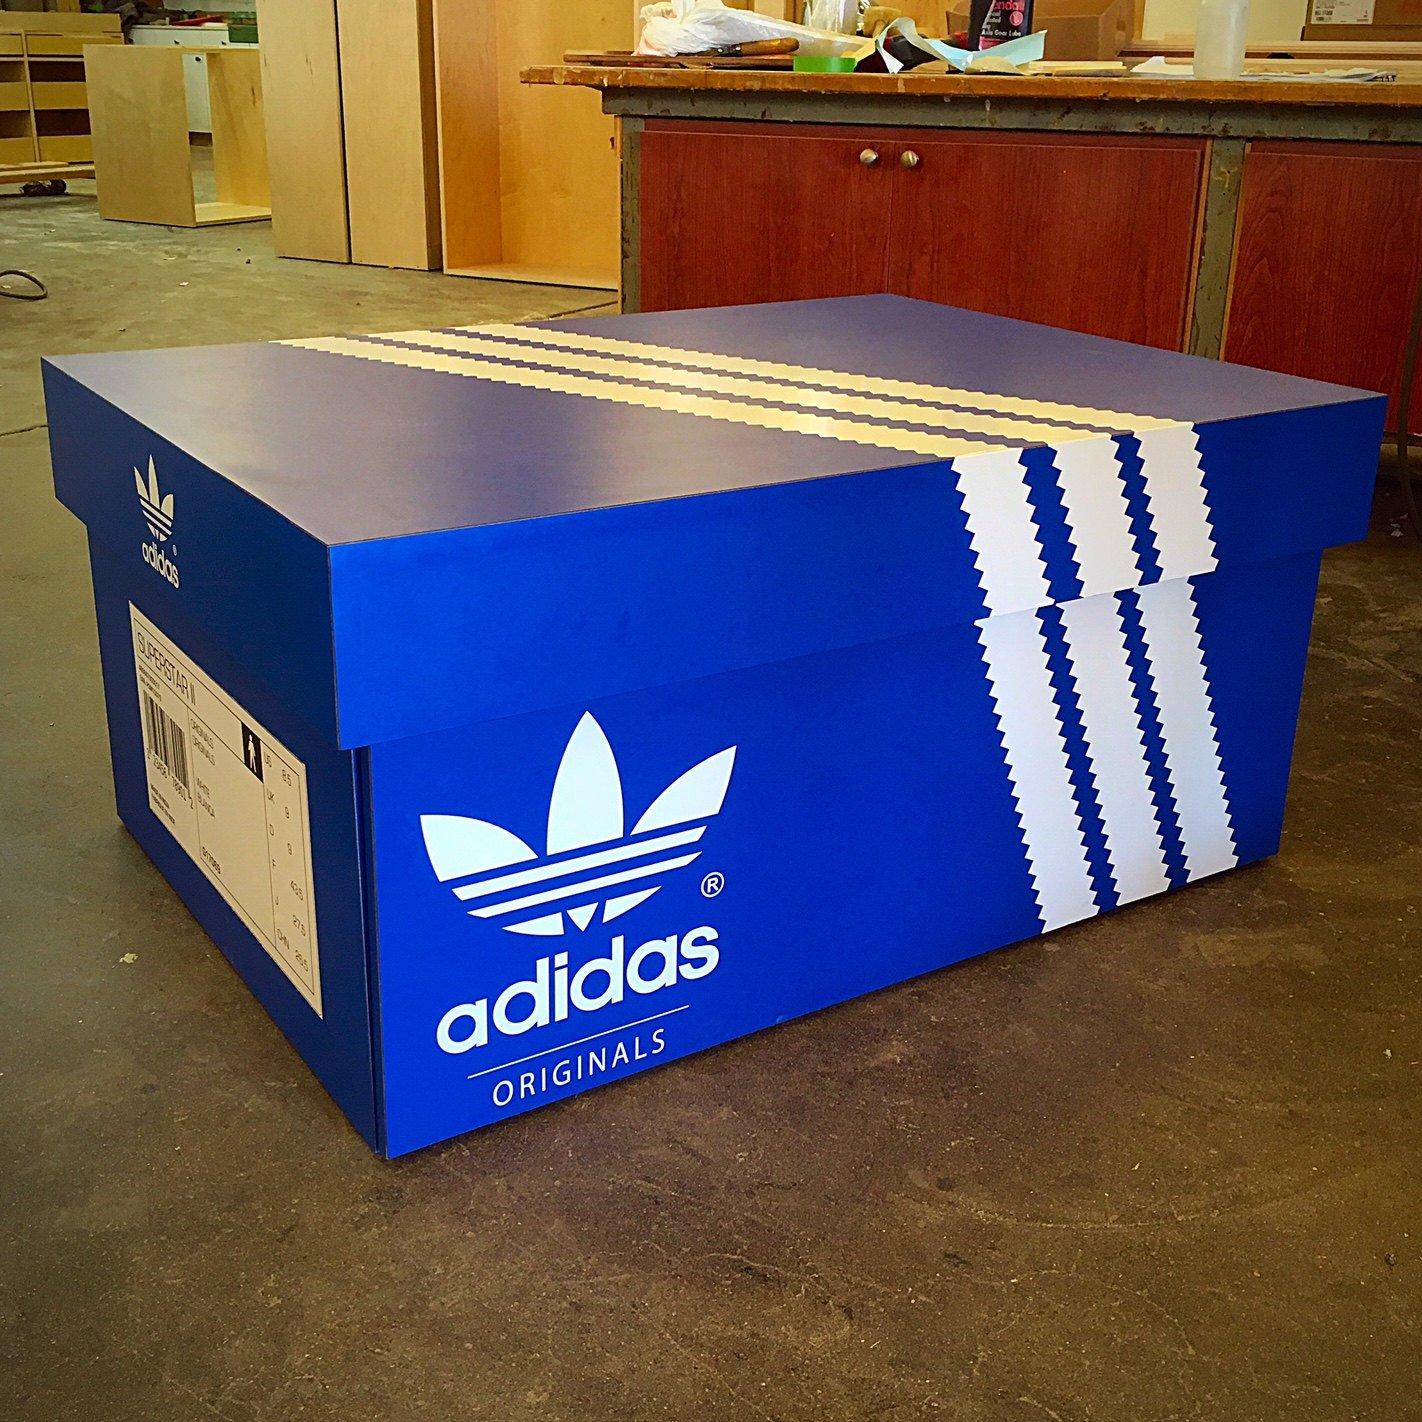 Adidas Shoe Box | TopFlightBoxes